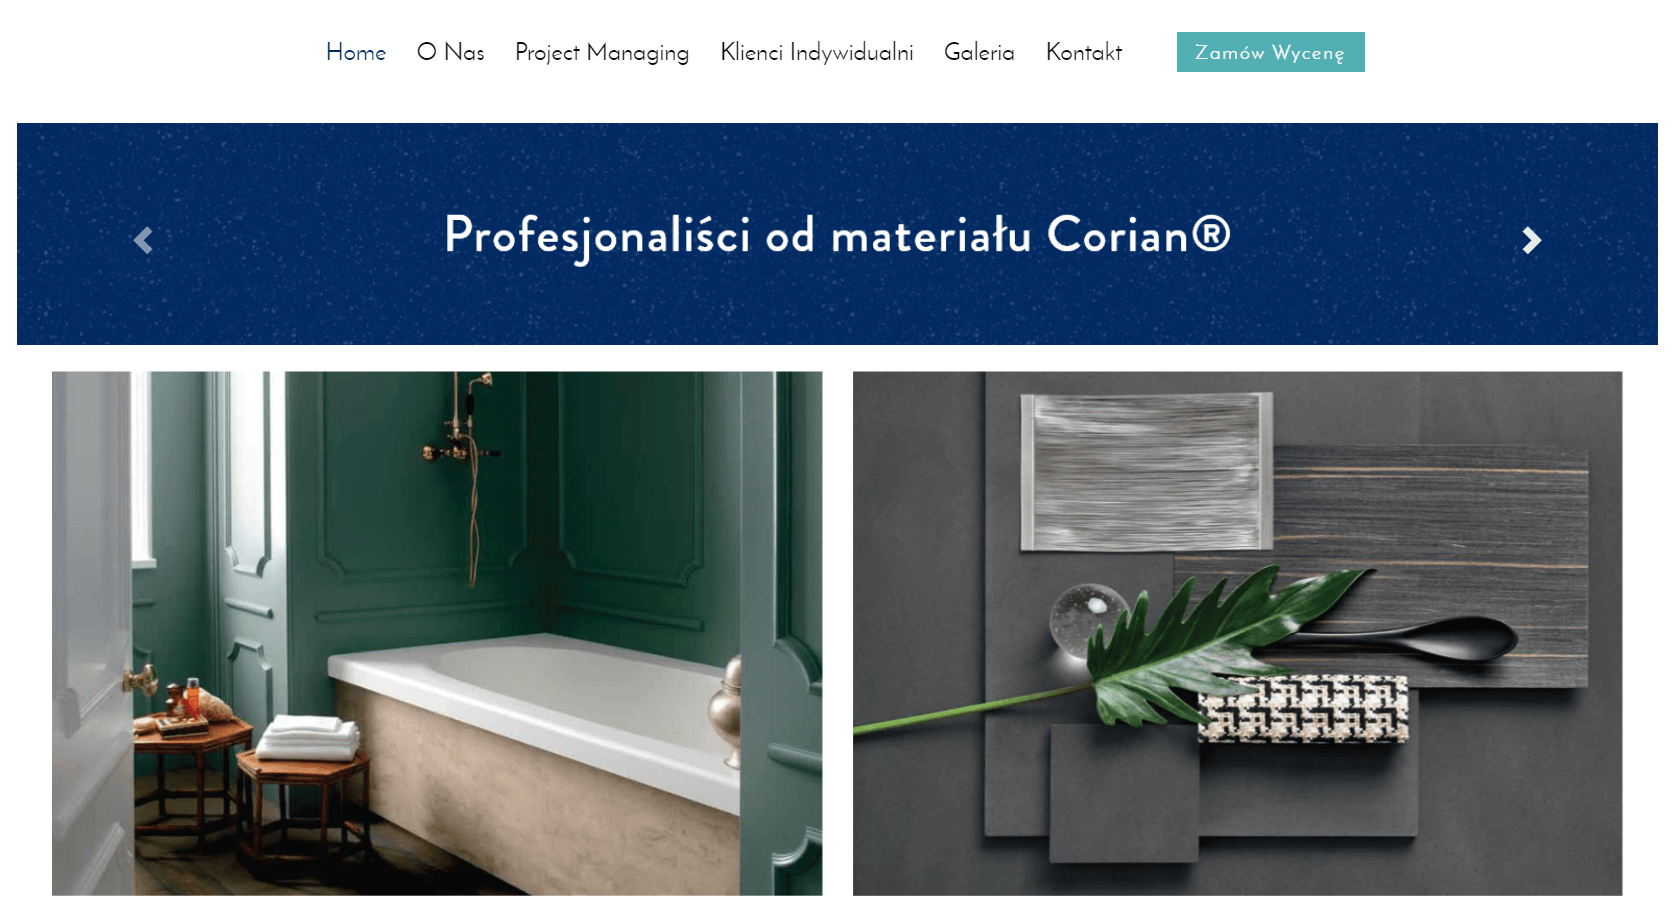 Cortic - Corian